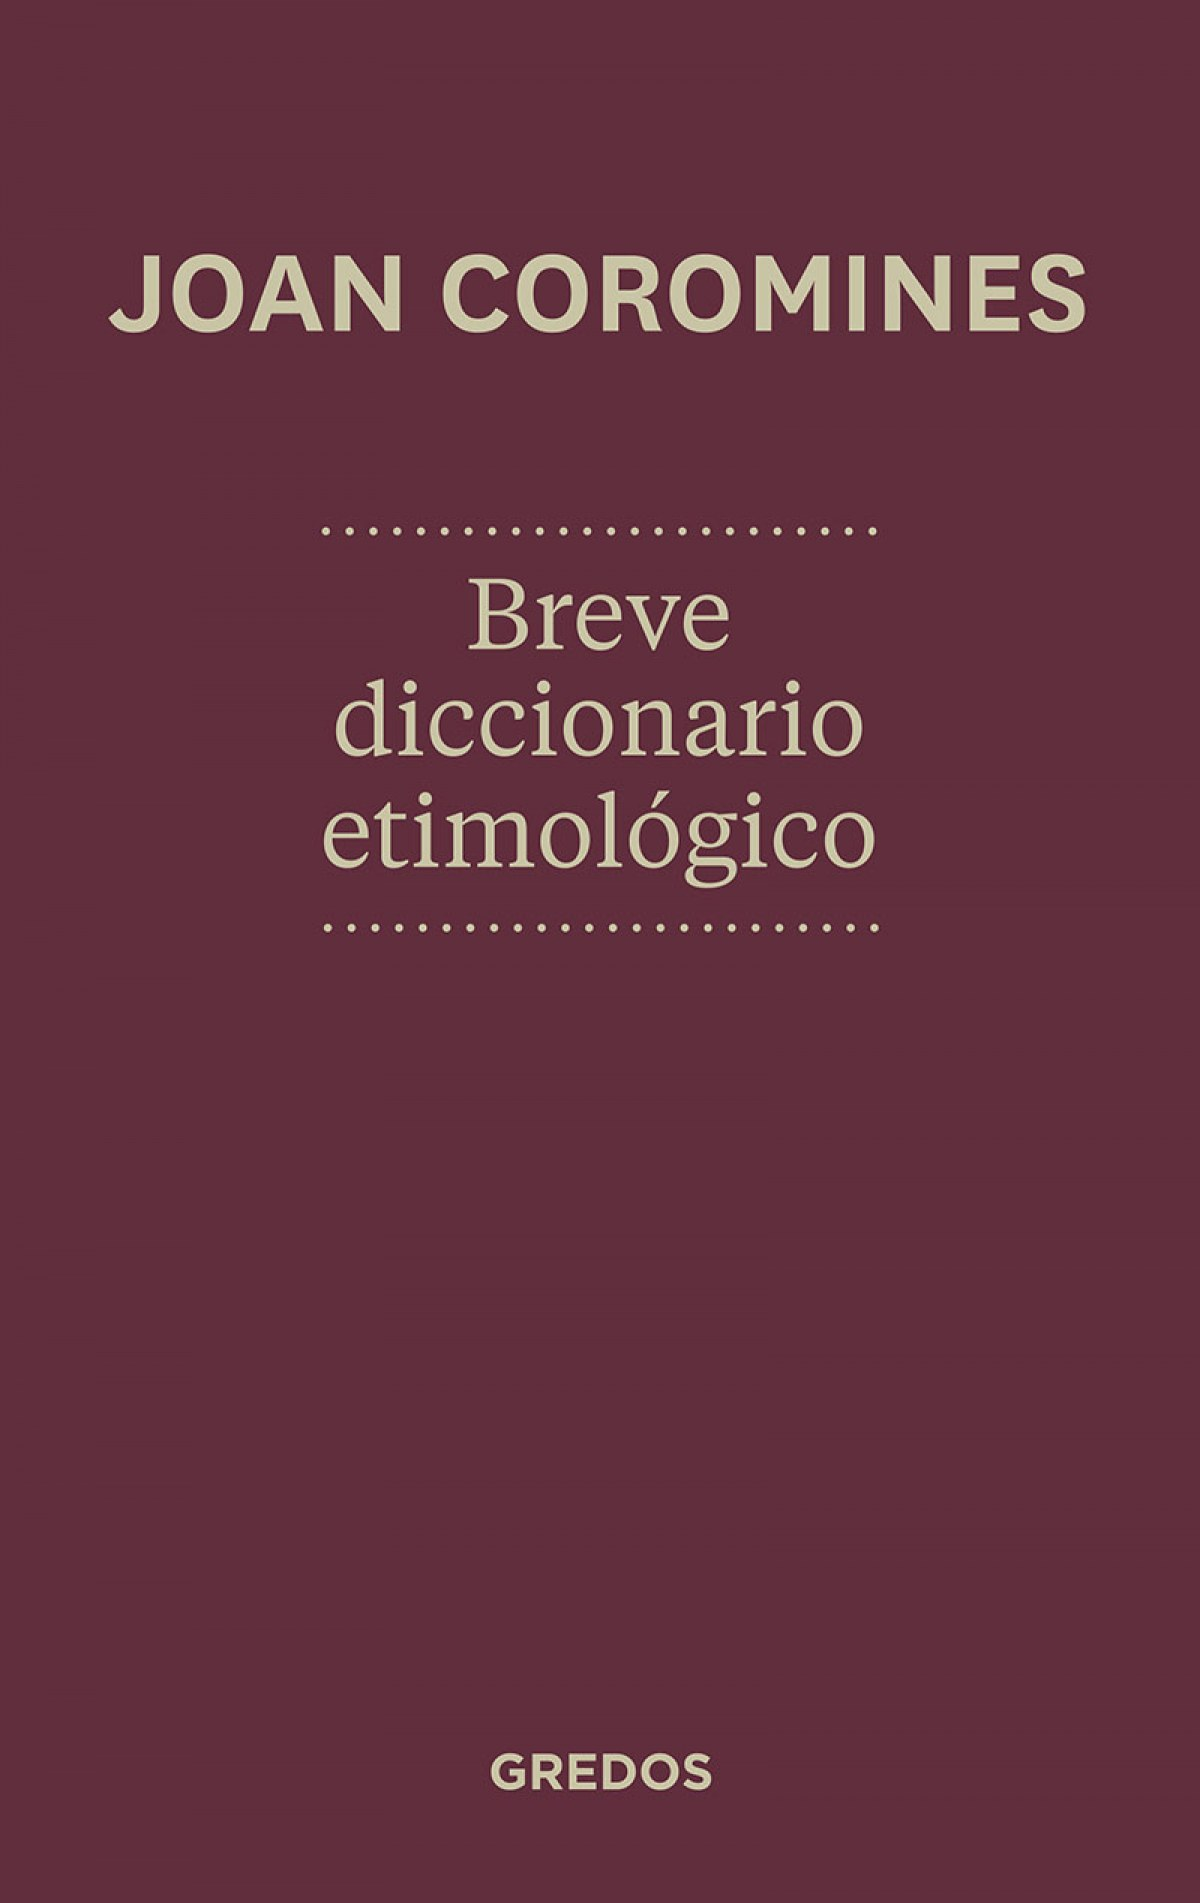 Breve diccionario etimologico 2012 9788424923648